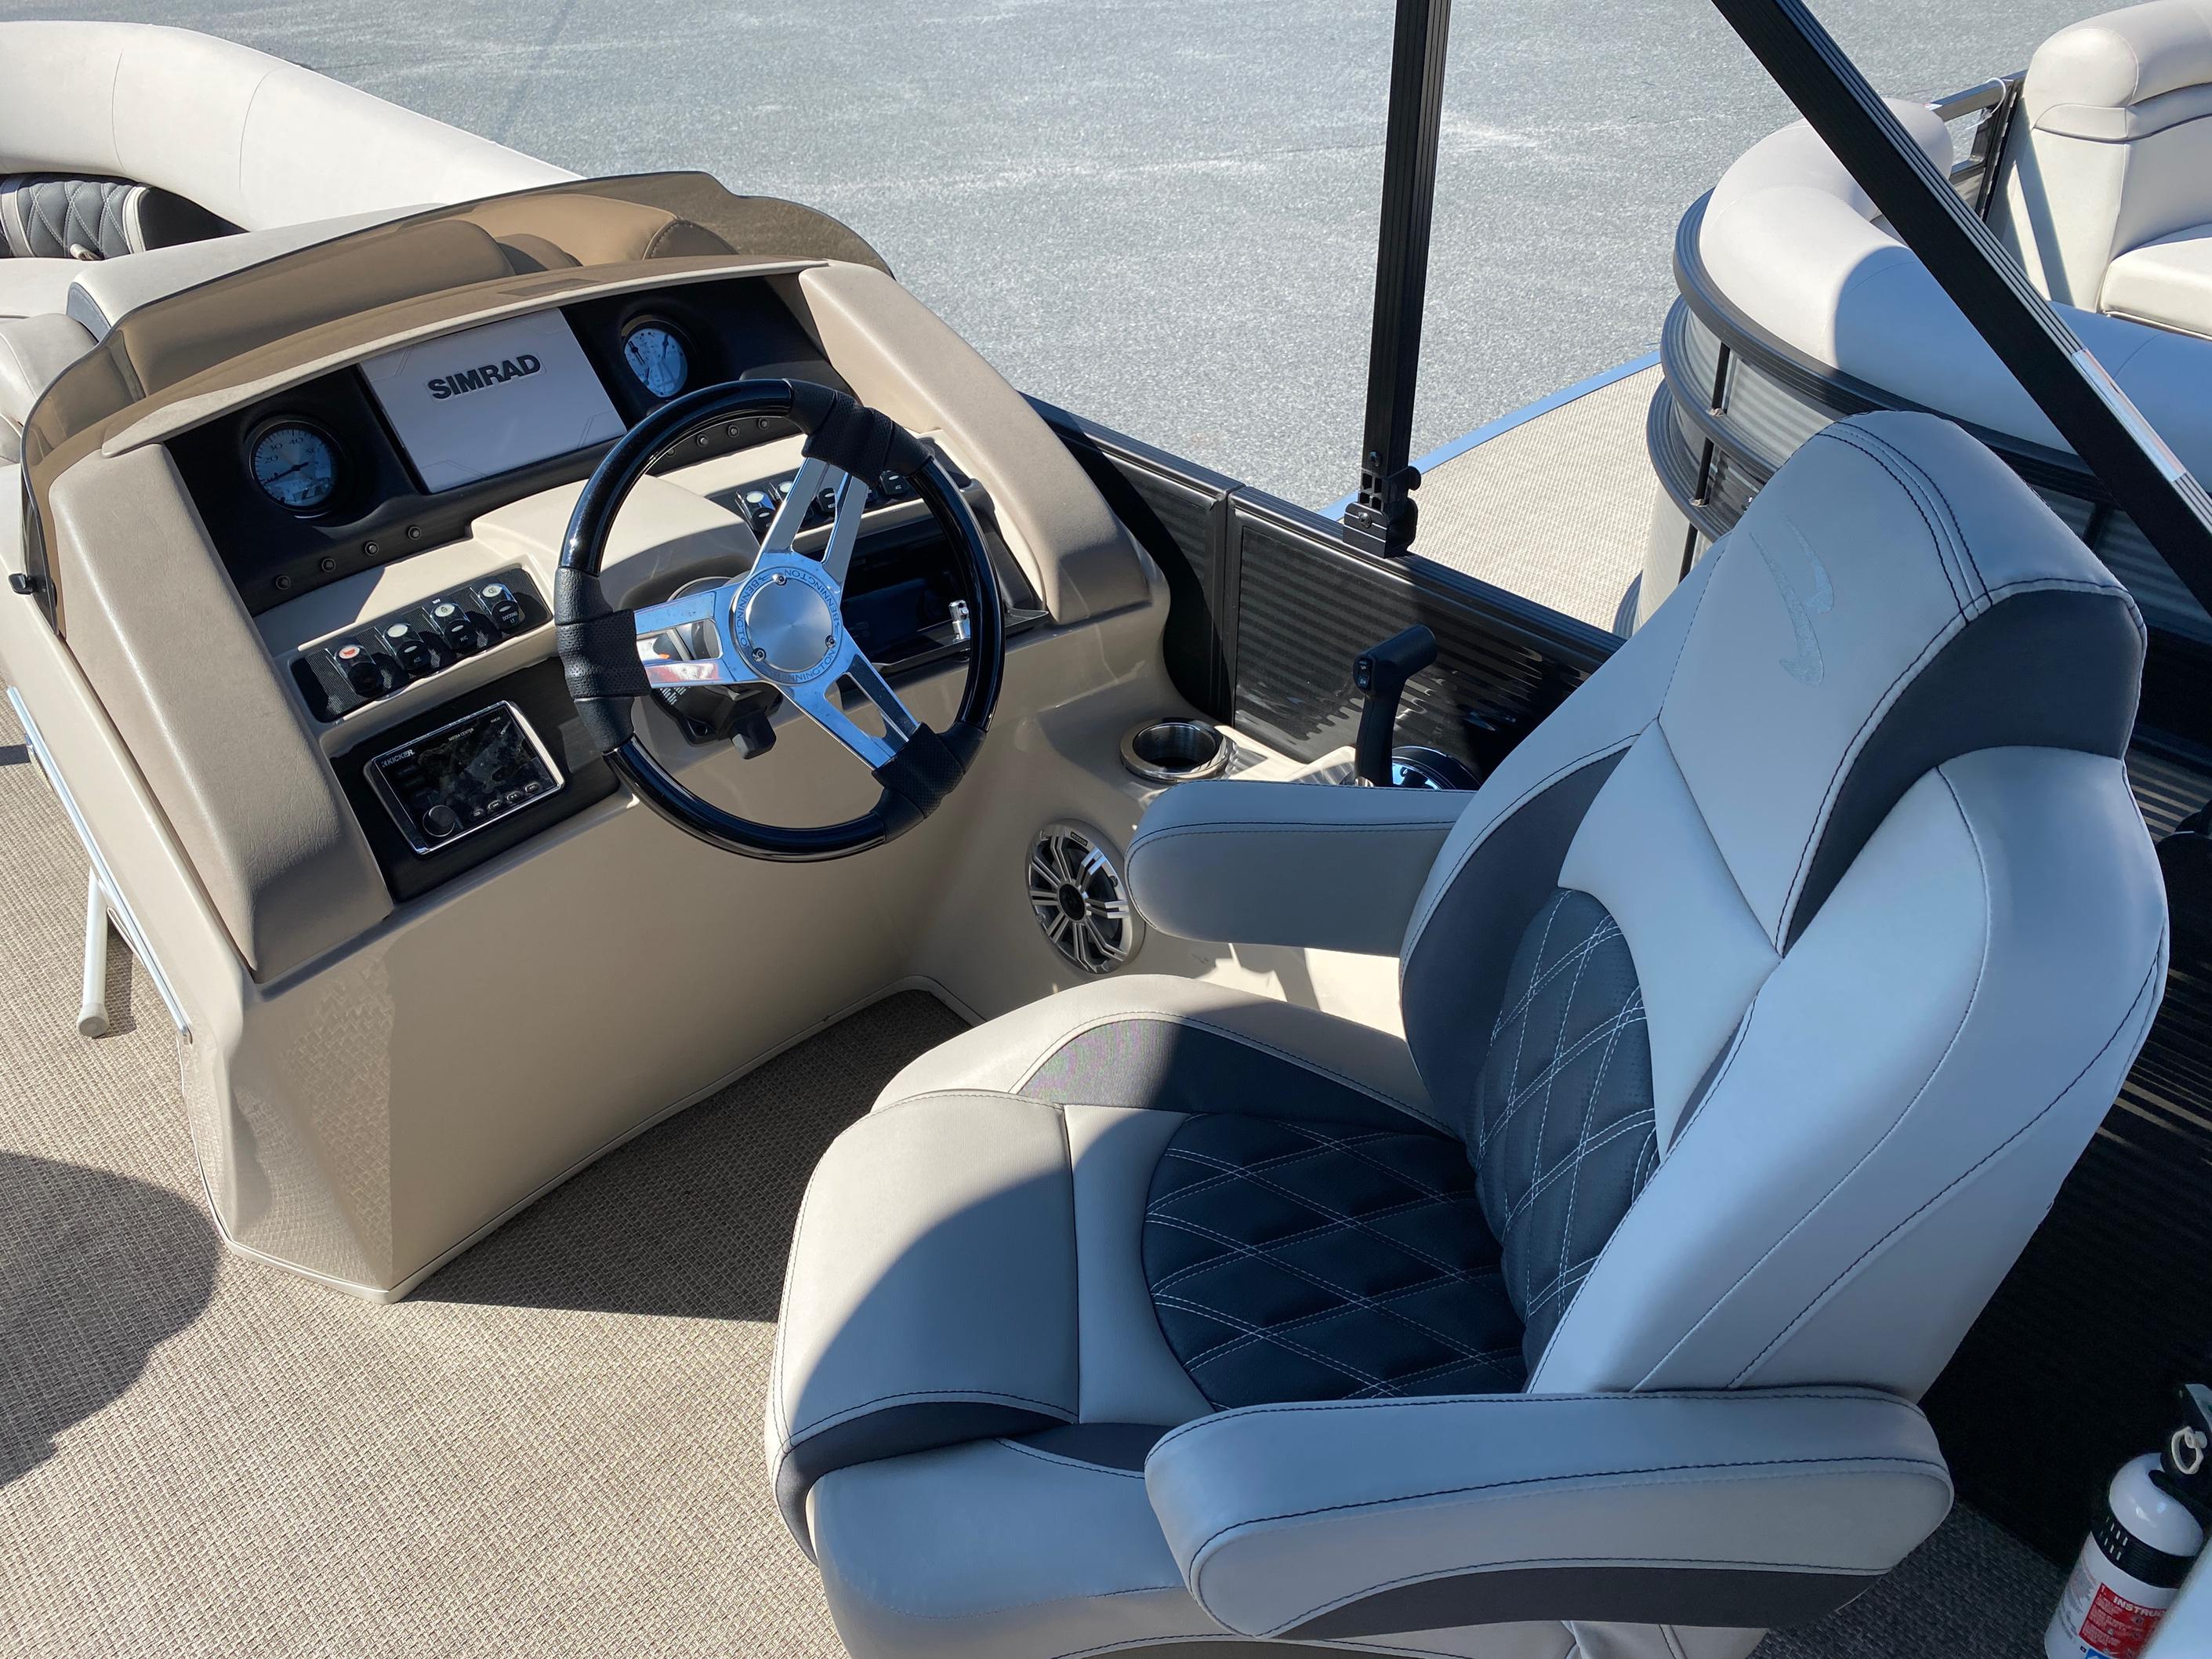 2019 Bennington boat for sale, model of the boat is 23 GSR & Image # 5 of 10